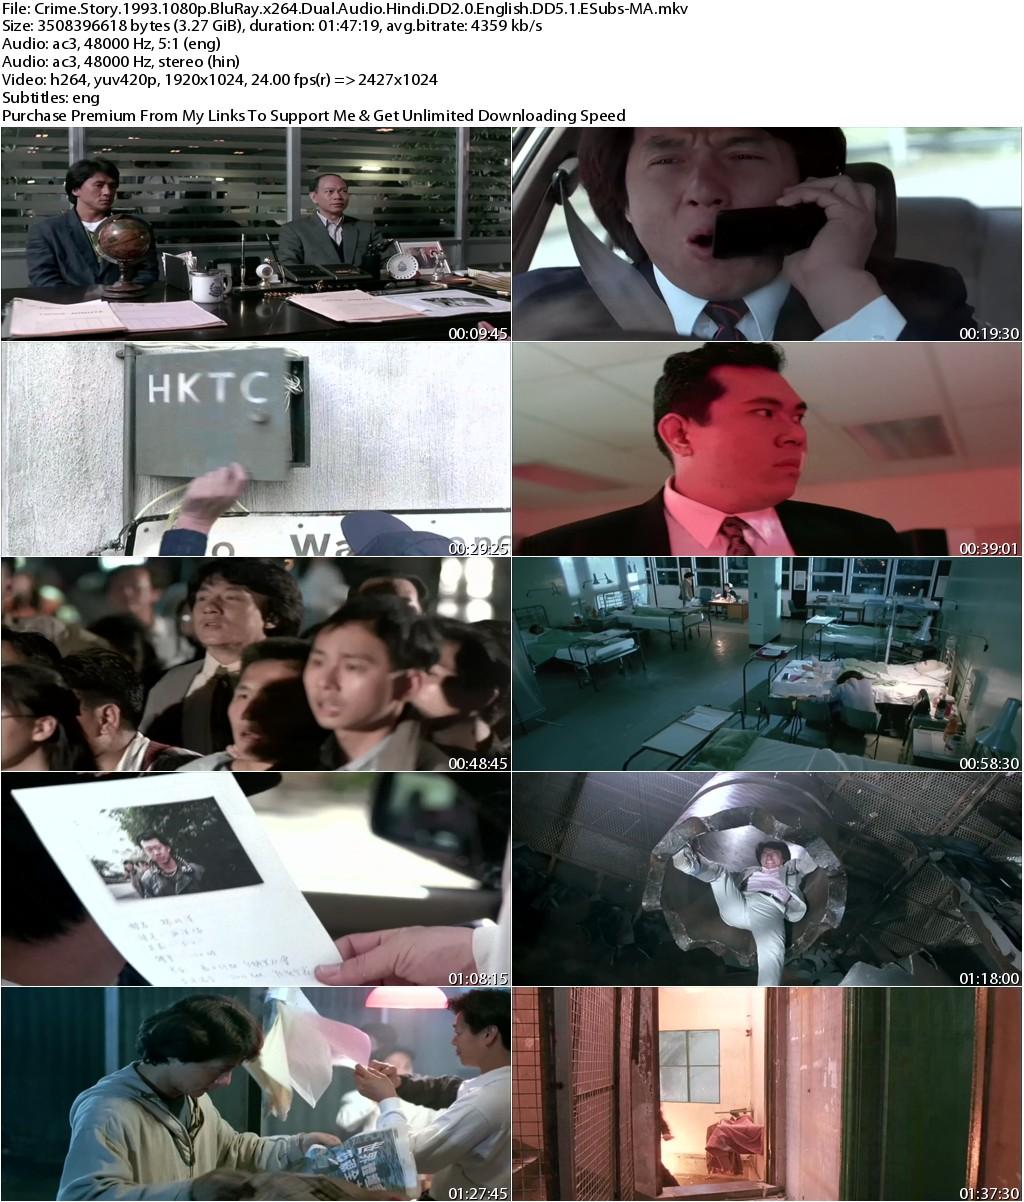 Crime Story (1993) 1080p BluRay x264 Dual Audio Hindi DD2.0 English DD5.1 ESubs-MA